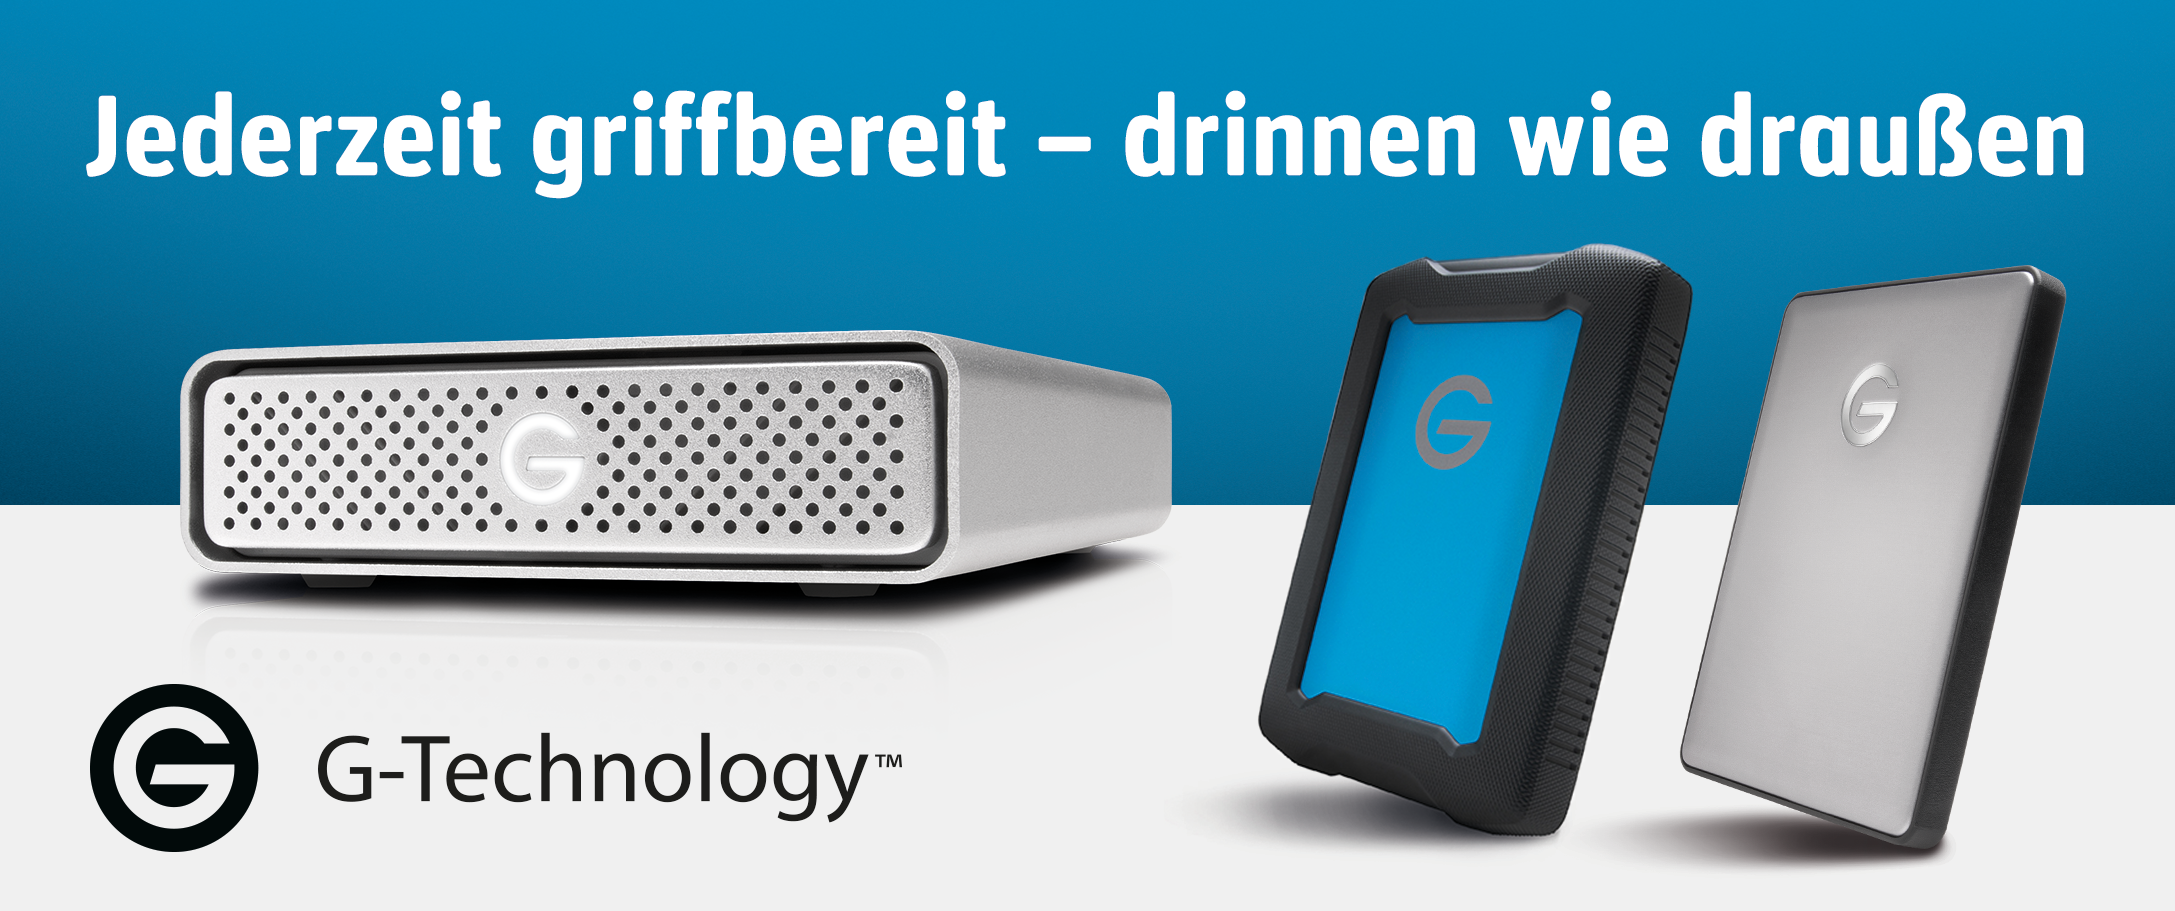 G-Technology Produktseite